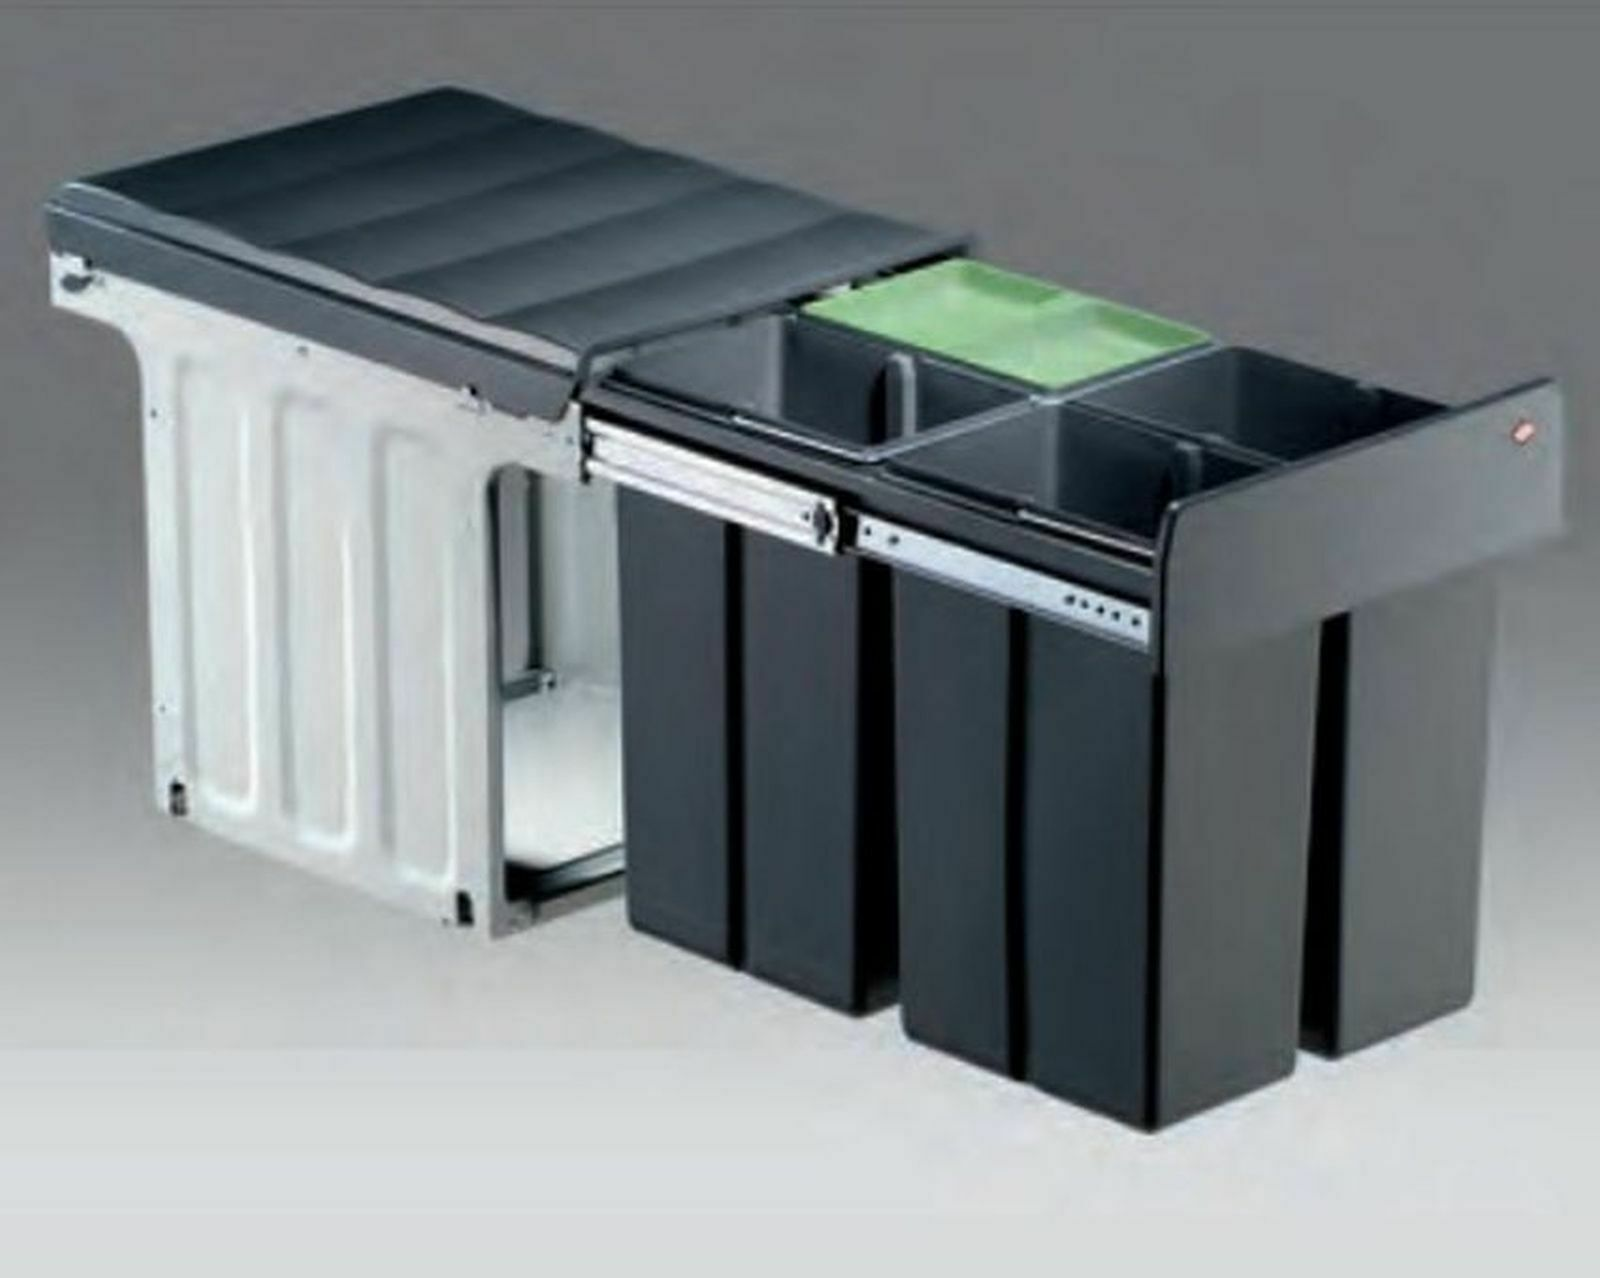 Wesco Bio Quartett 4 x 10 Liter Küchen Abfall Mülleimer 4-fach ...